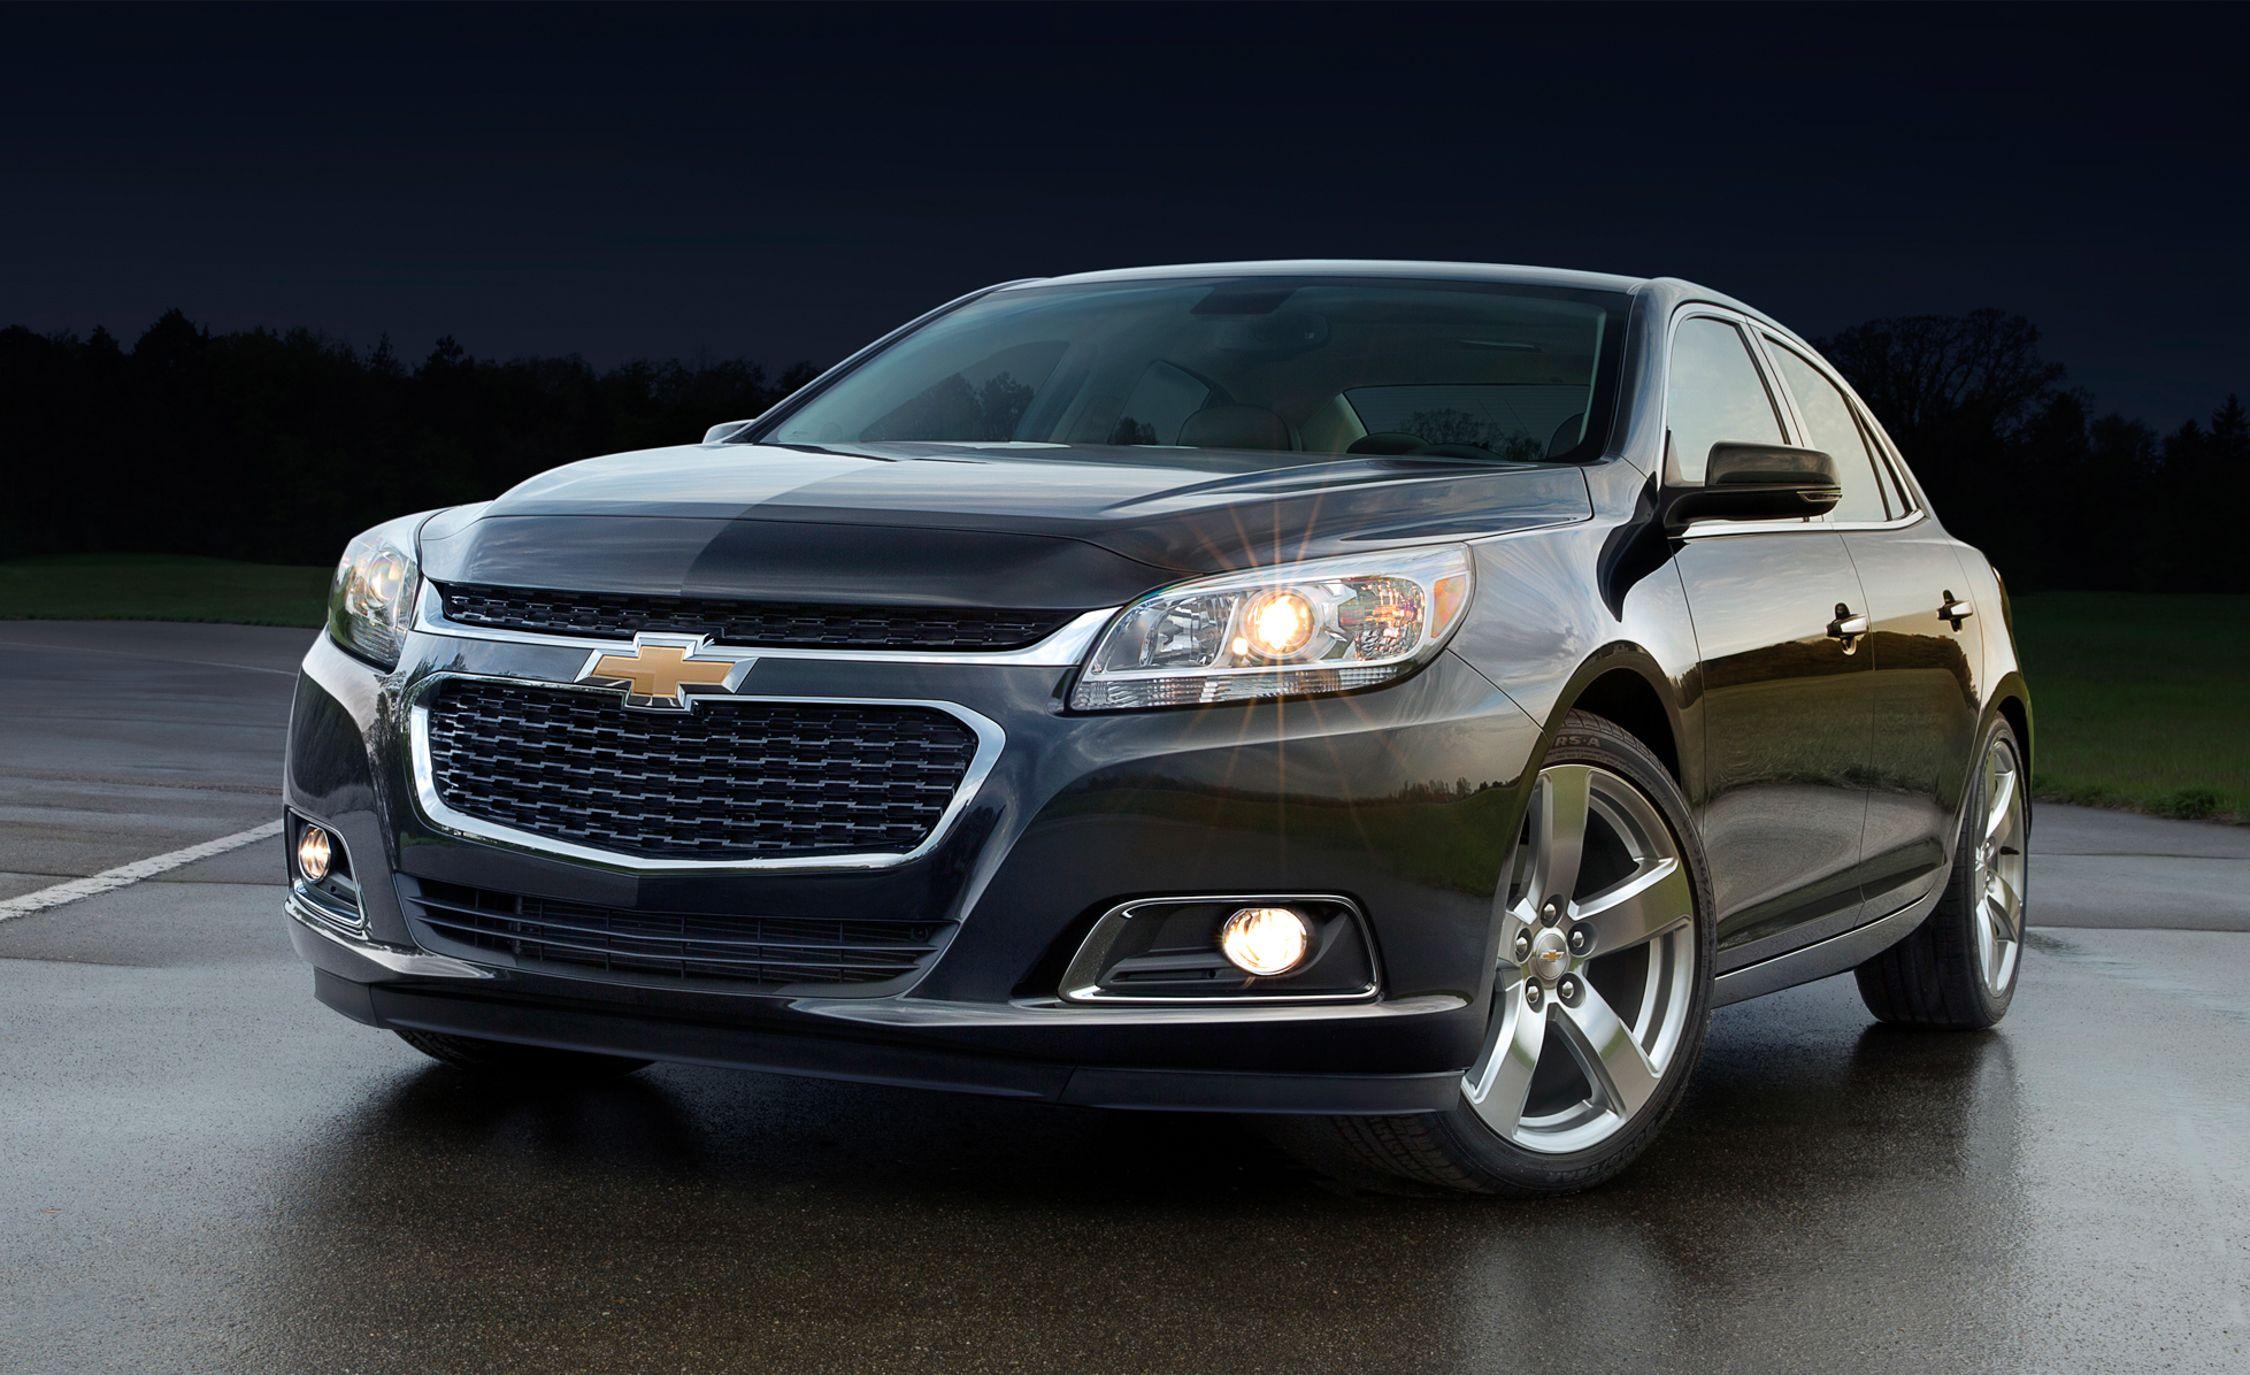 2014 Chevy Malibu For Sale >> 2014 Chevrolet Malibu Photos And Info News Car And Driver